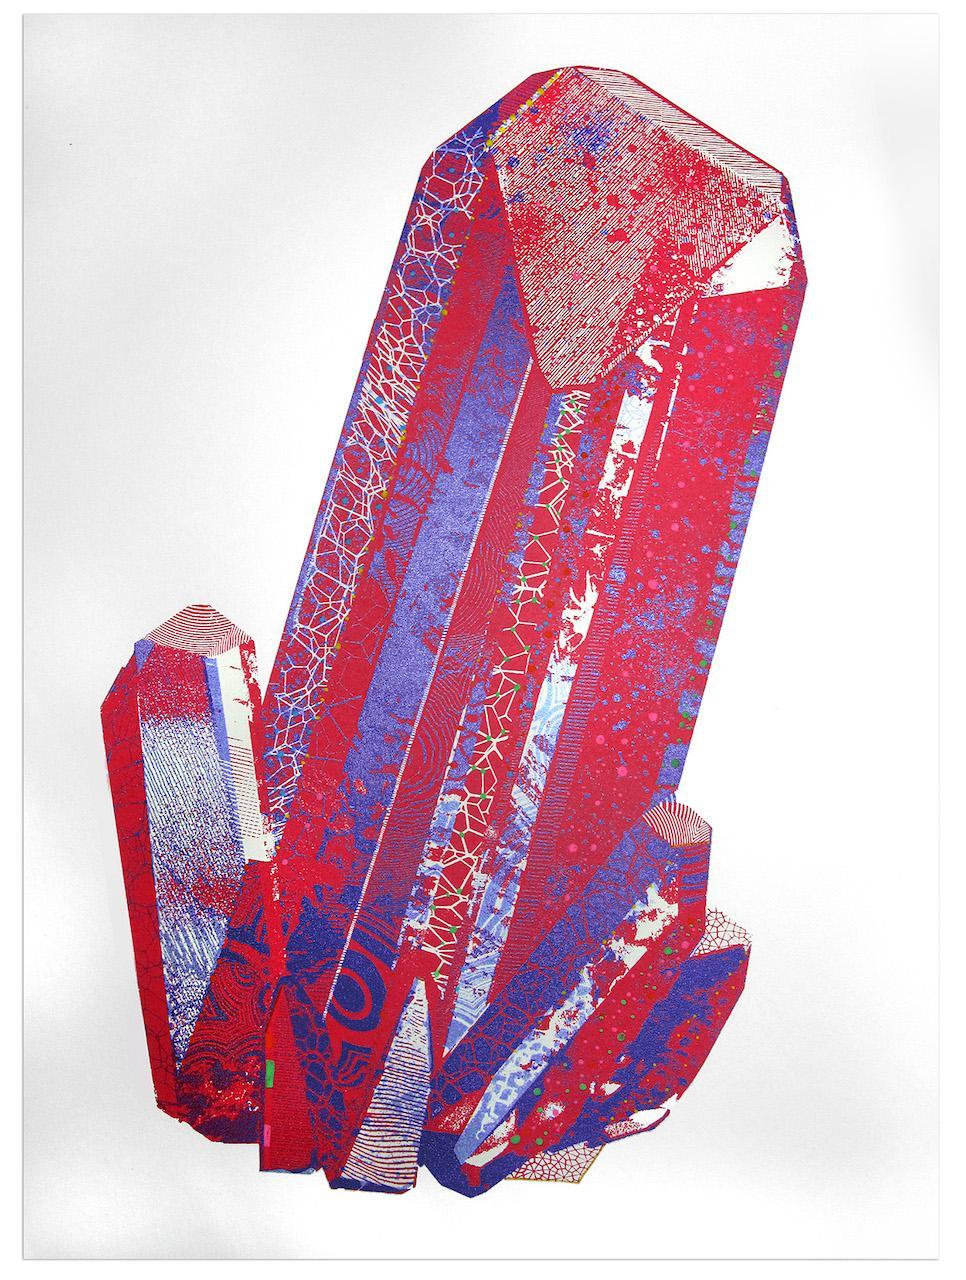 Chris Keegan, Red Gemstone, Limited Edition Print, Bright Art, Cubist Art, Happy